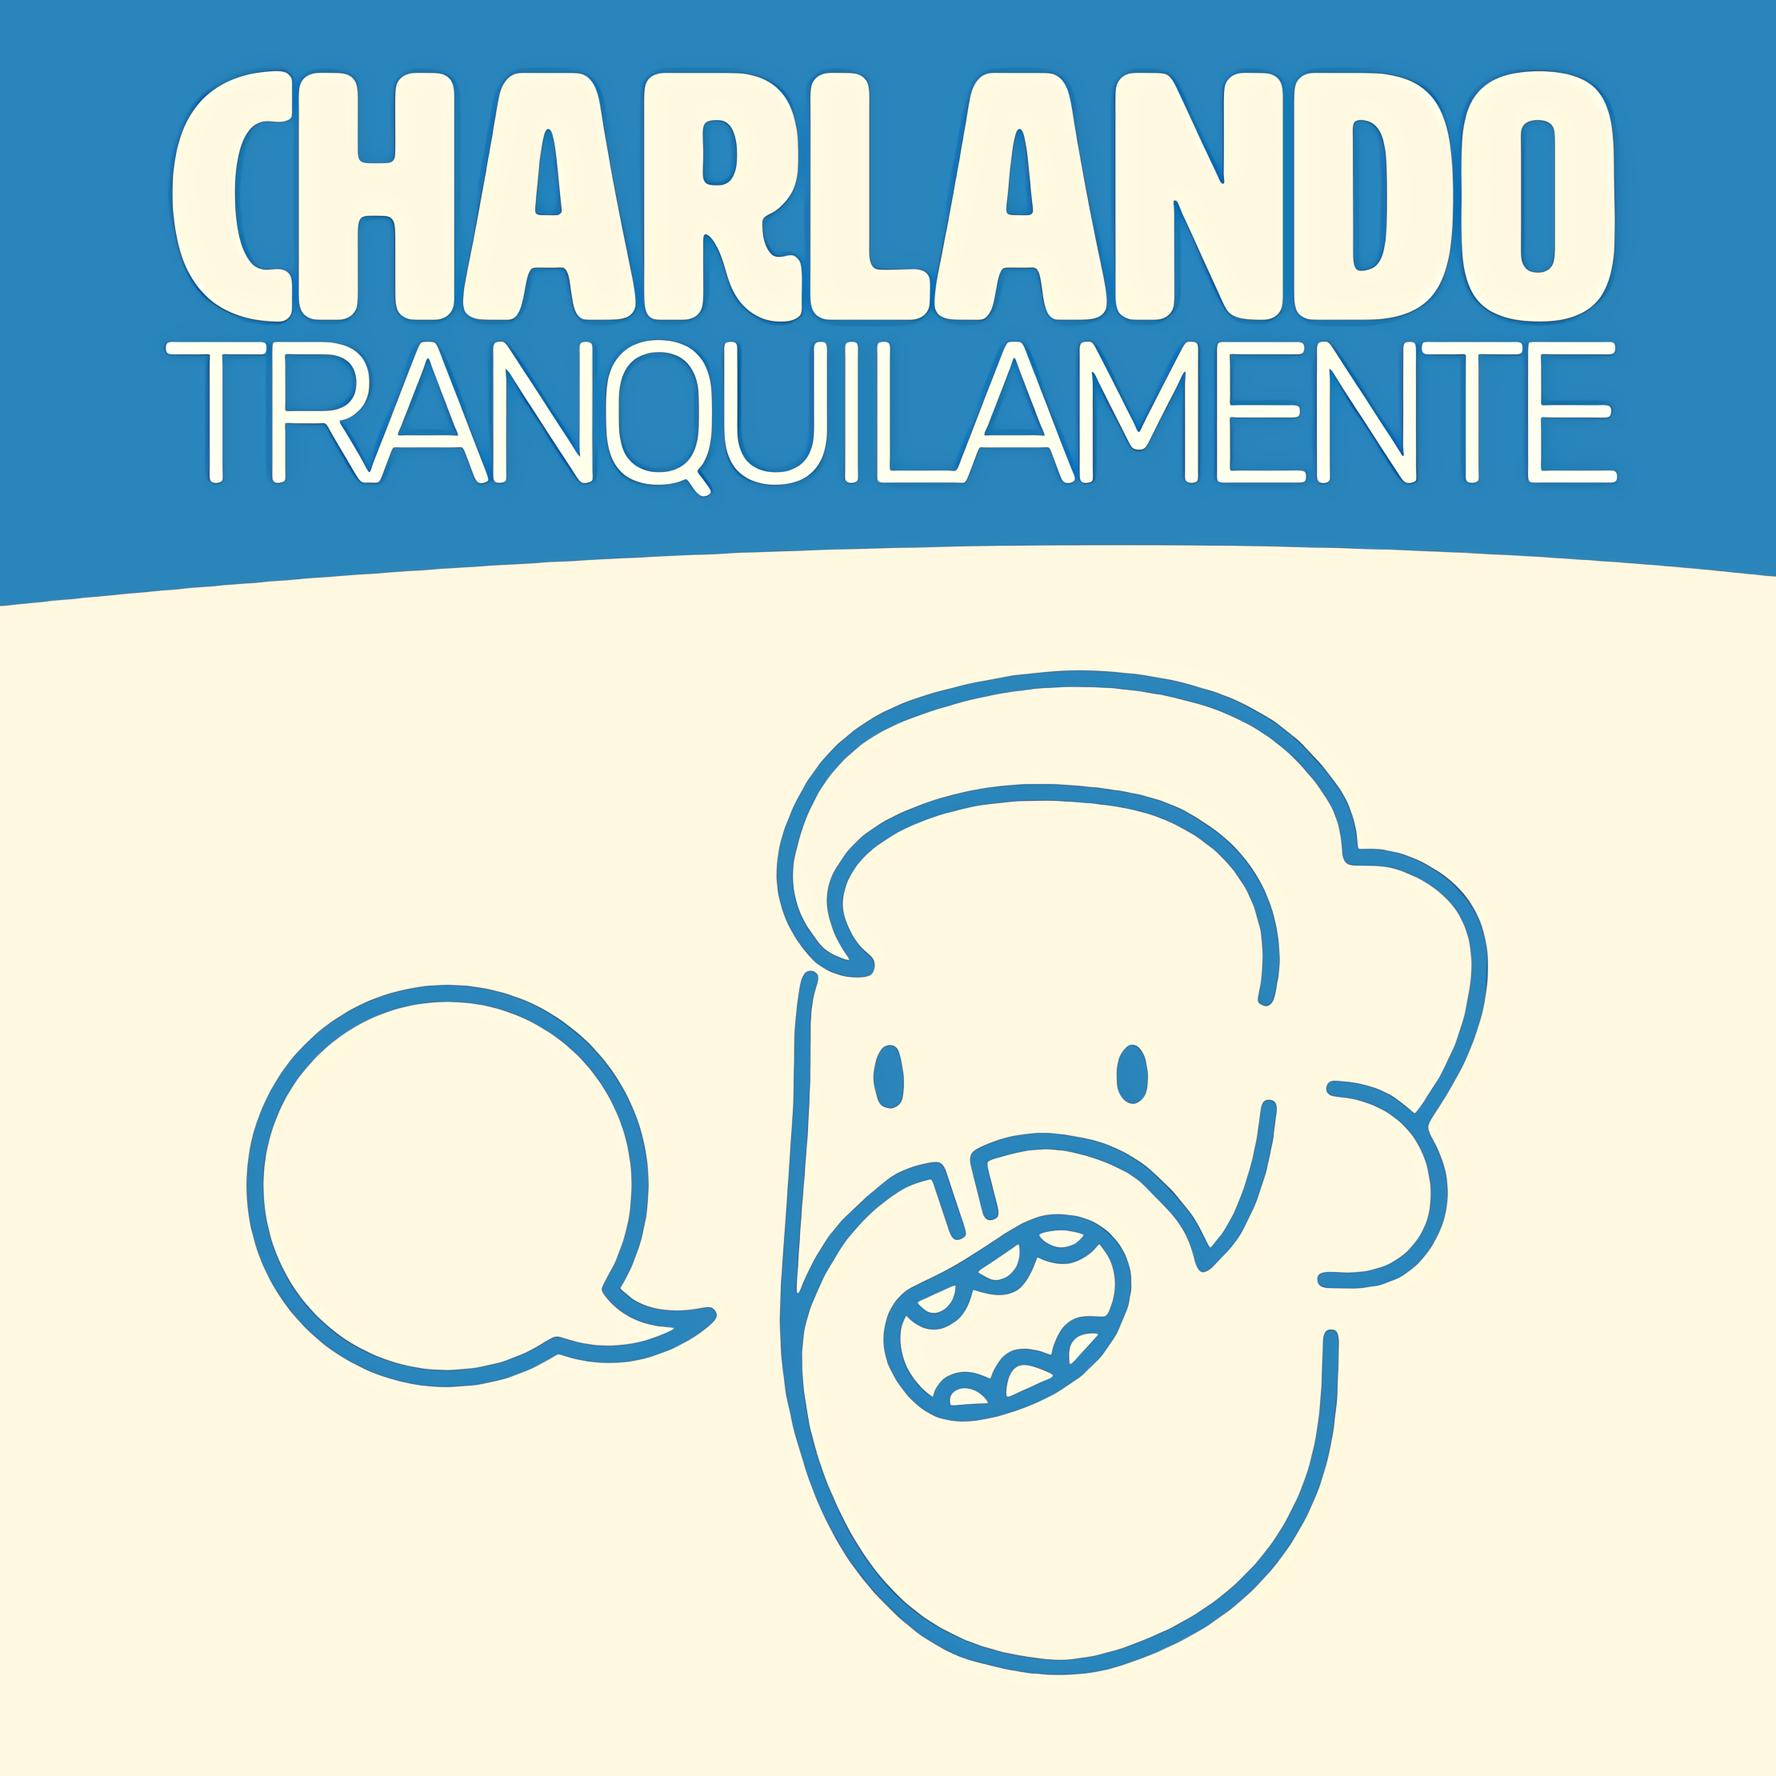 Charlando Tranquilamente #7 con JOSEP PEDREROL